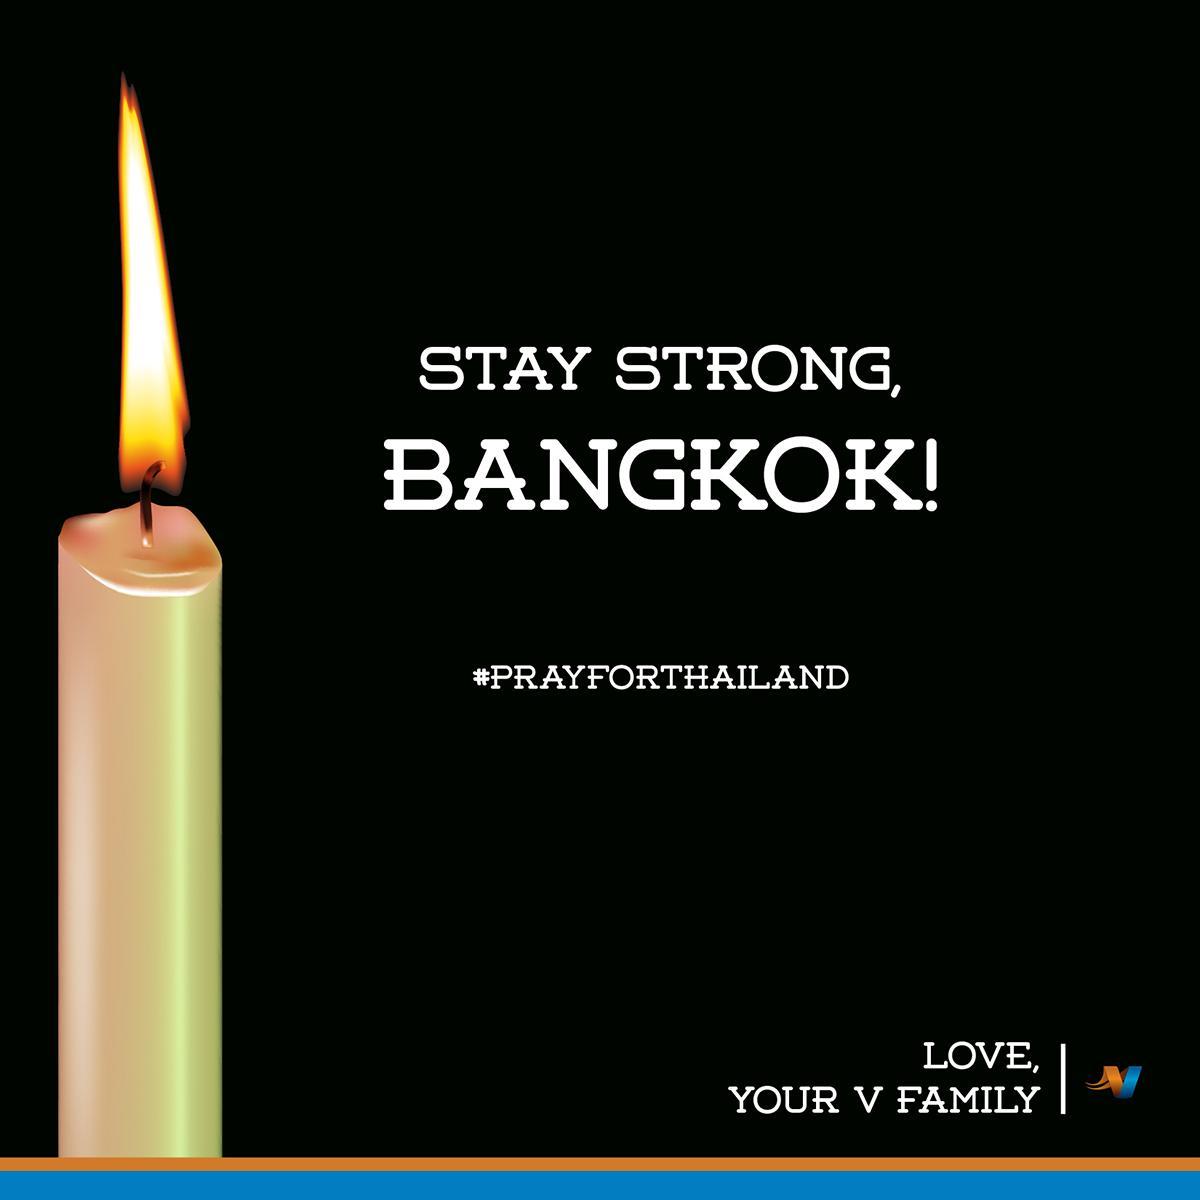 To our dear V Family in Thailand! #StrongerTogether #PrayForBangkok #PrayForThailand http://t.co/OsXzB1inyC